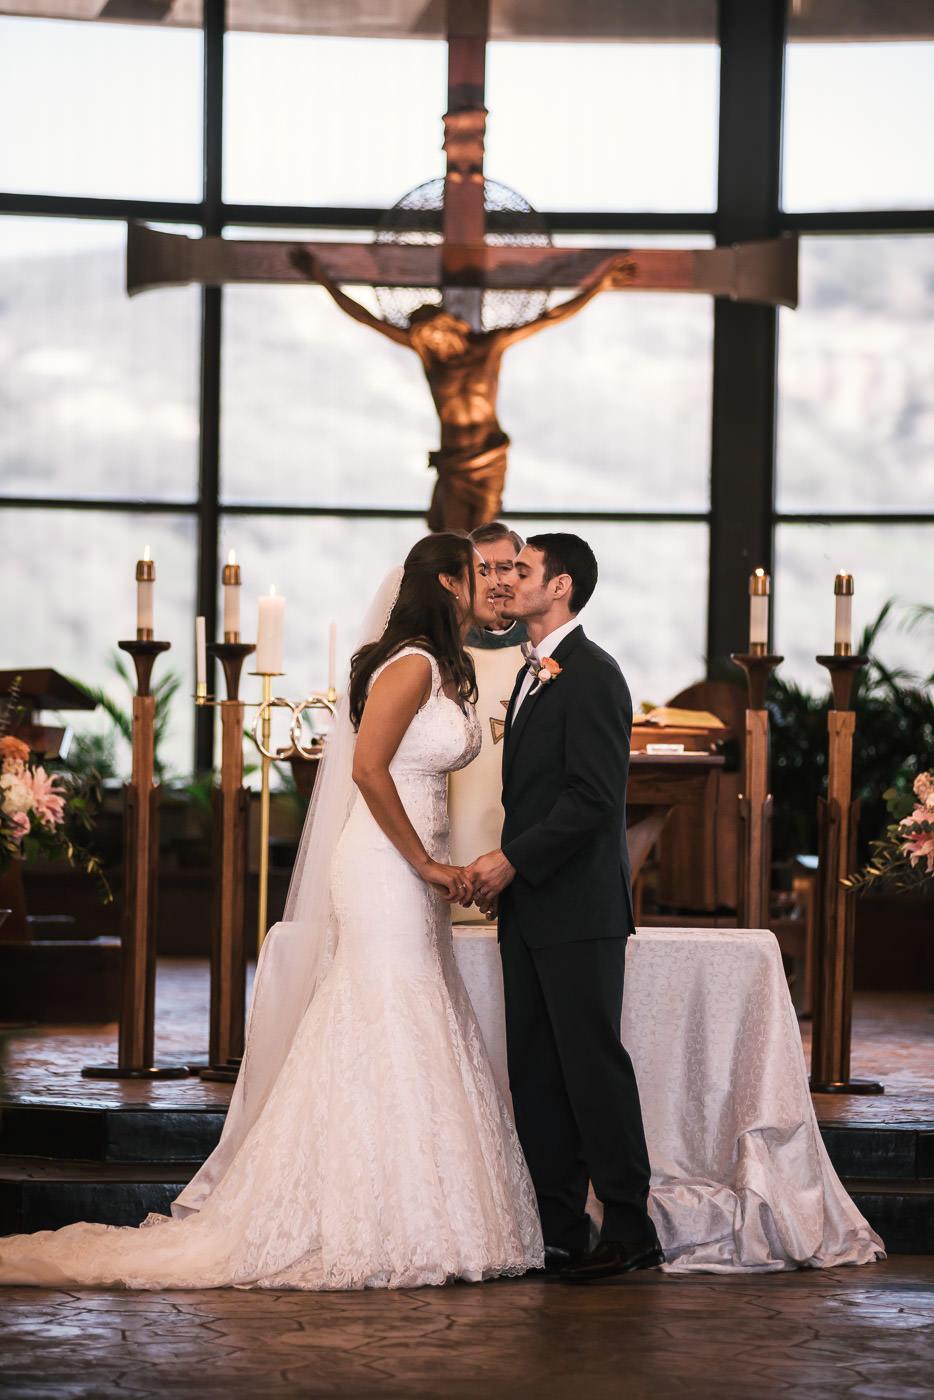 St Therese Carmel Church wedding photographer.